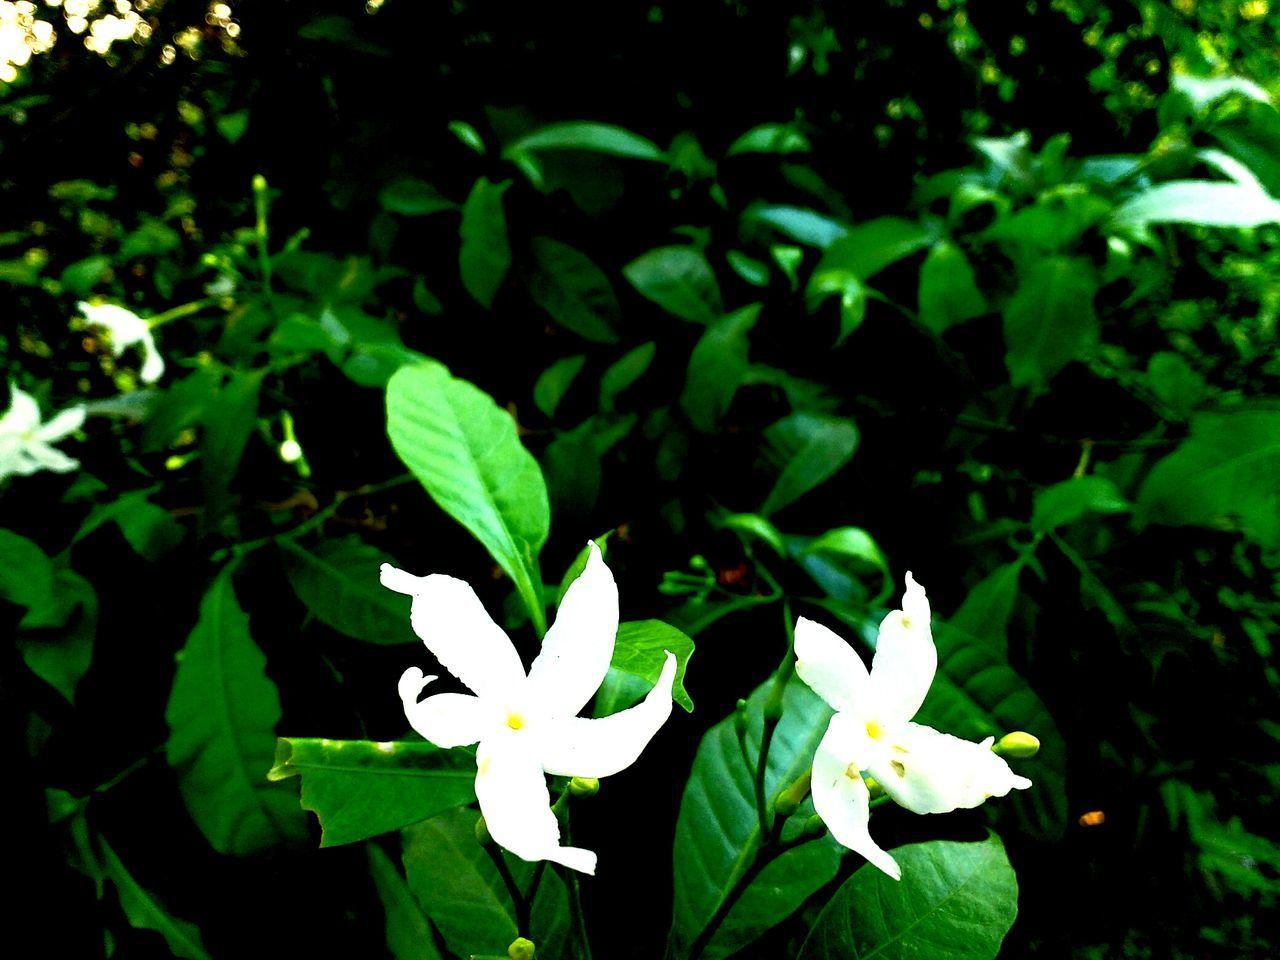 White Flowers Dual Flower Green Nature Beautiful Nature EyeEm Nature Lover Eye4photography  Beautifully Organized